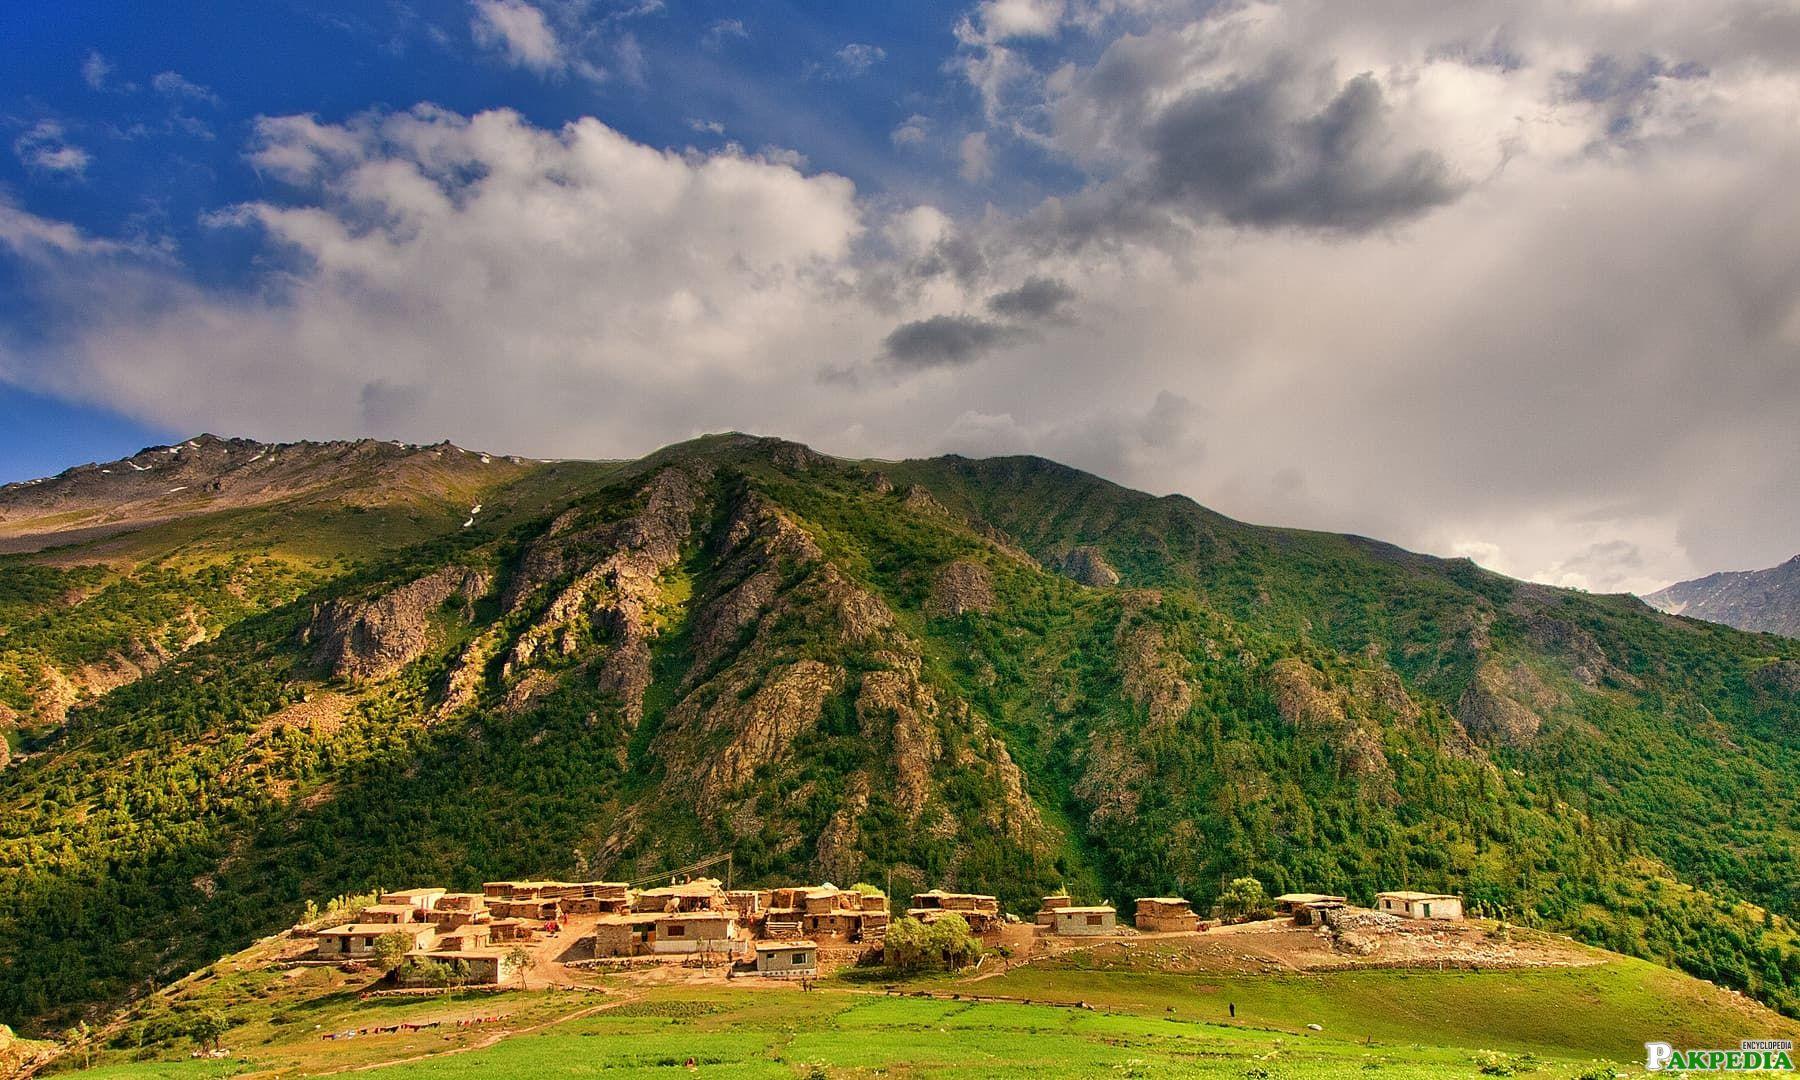 Chillam Village